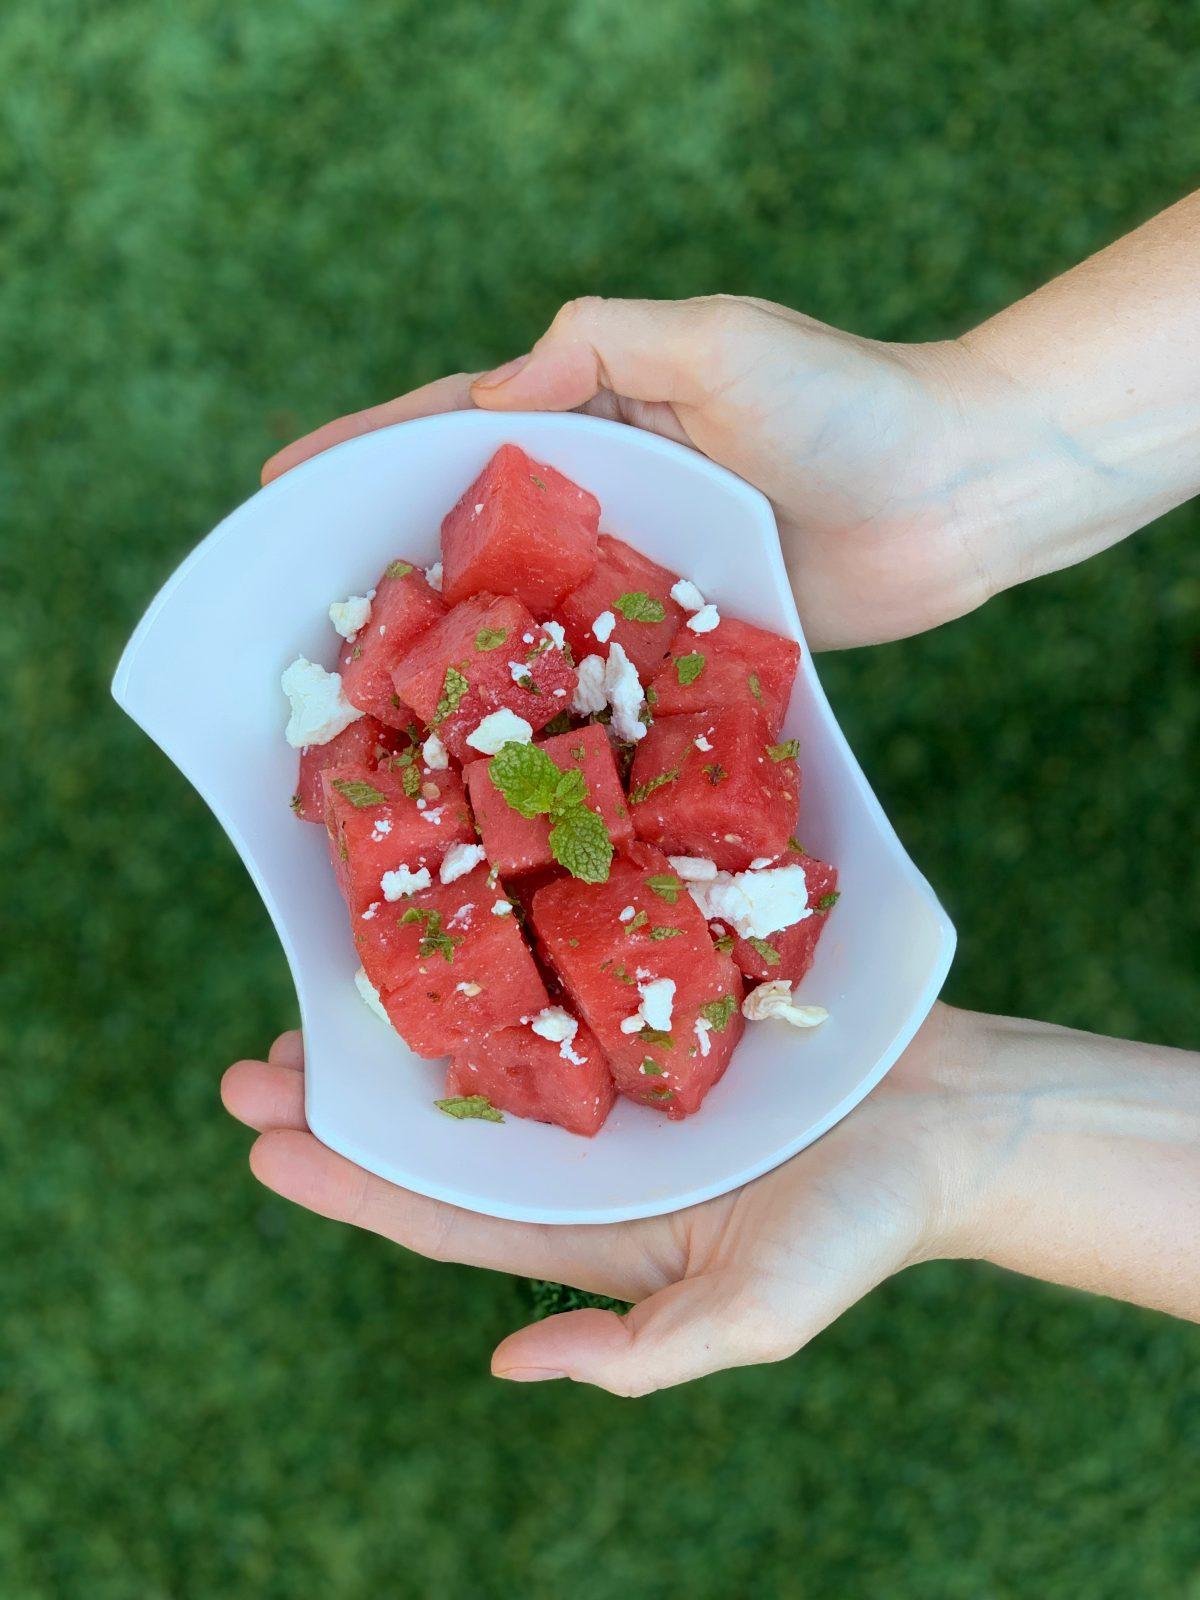 Summer Chef / Fitness Partner Tip